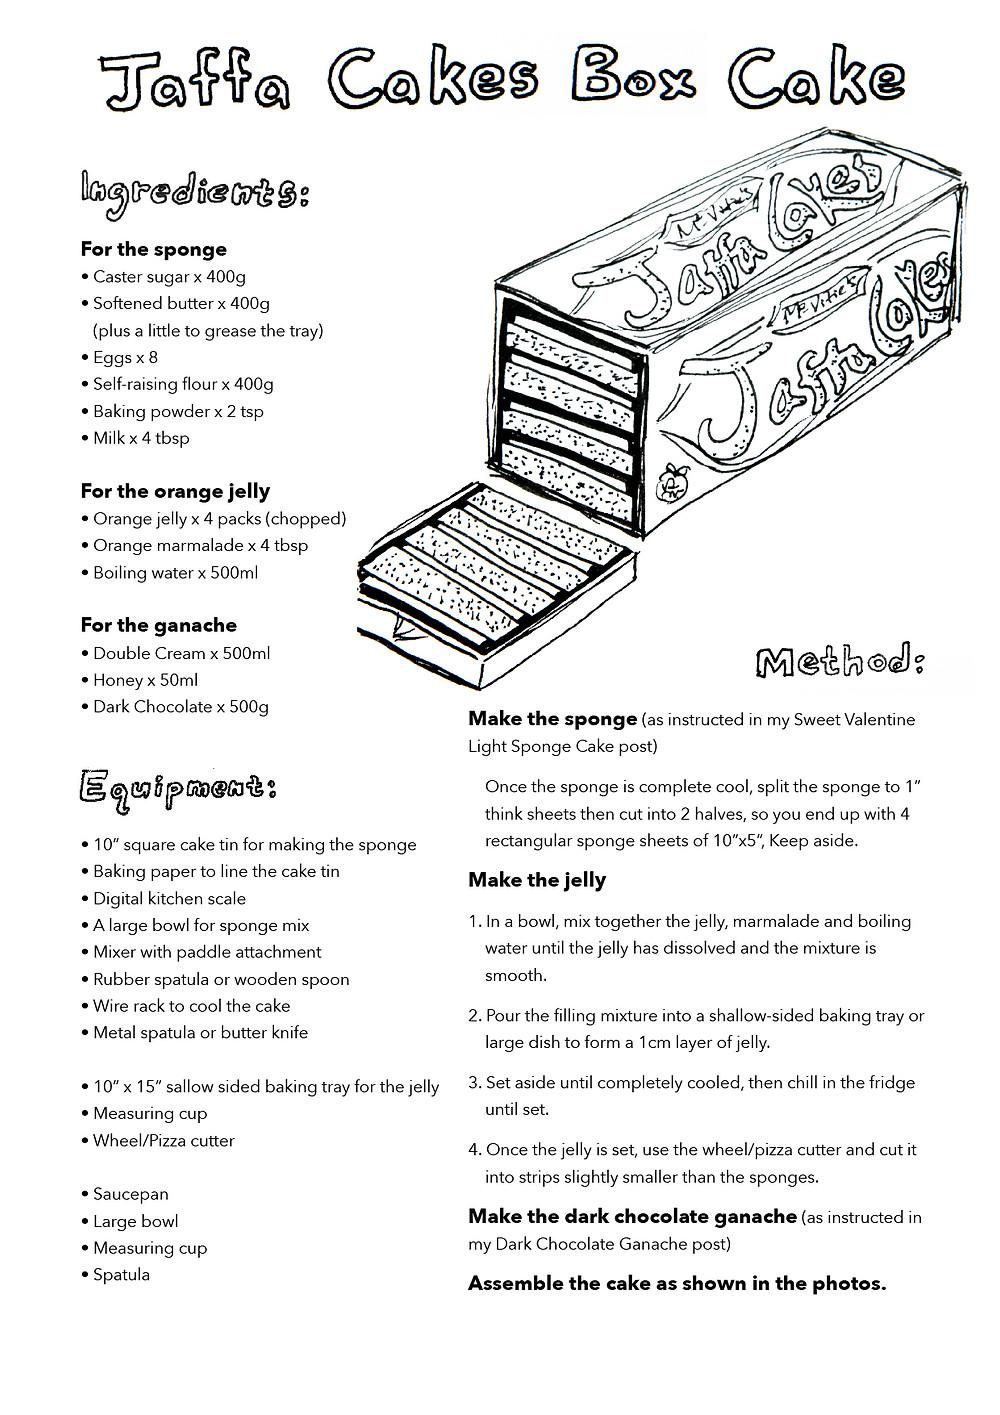 Jaffa Cakes Box Cake recipe